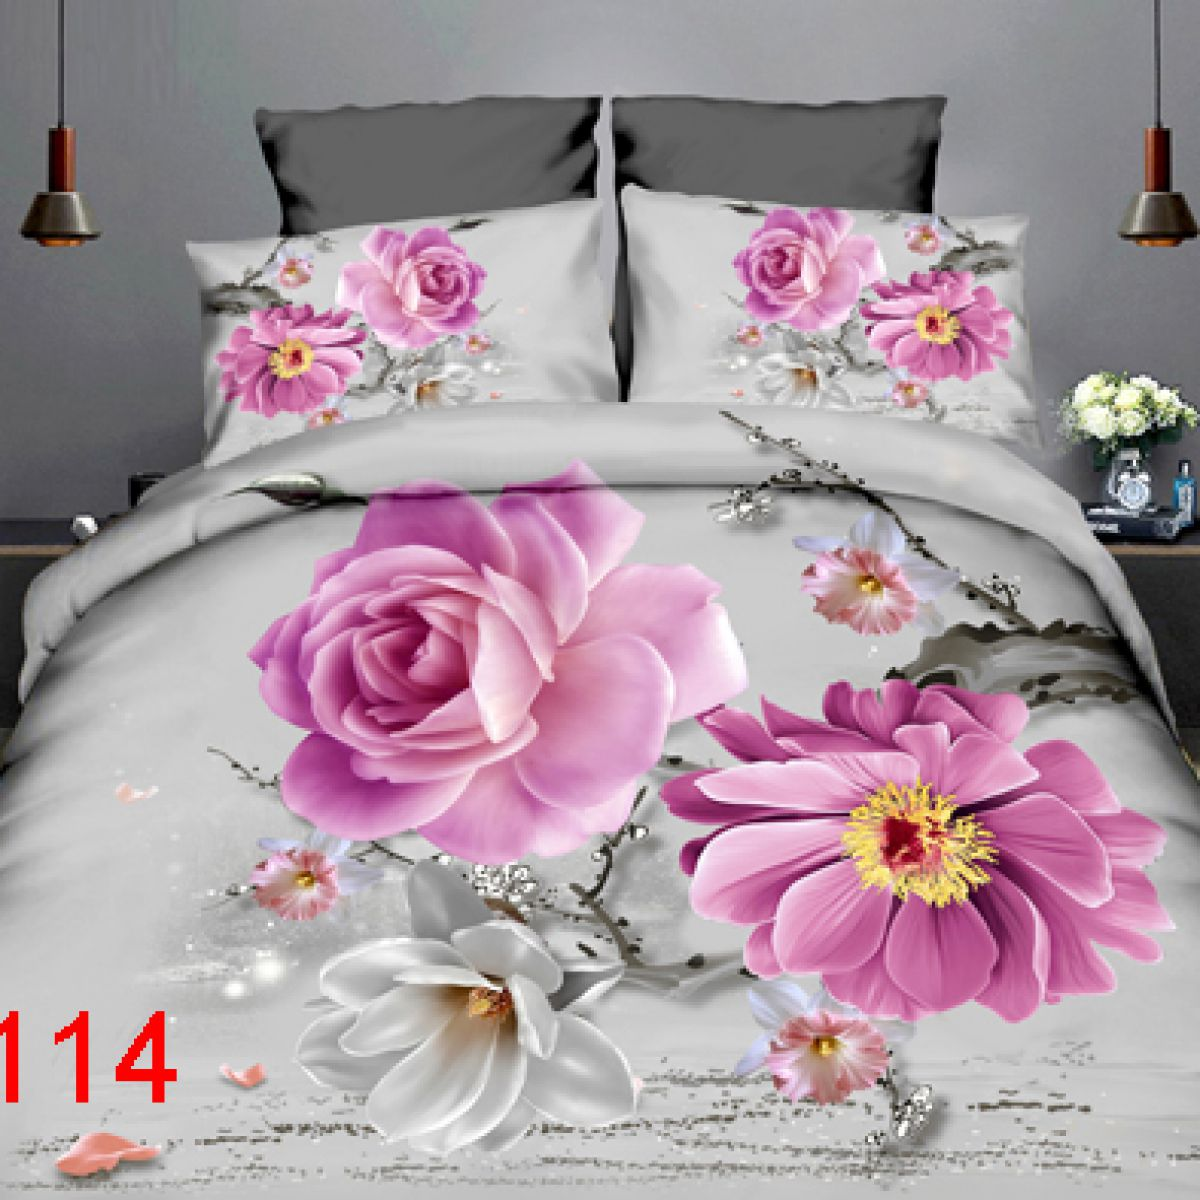 3D Beddings - Antonio - AML-114 - 160x200 cm - 4 pcs